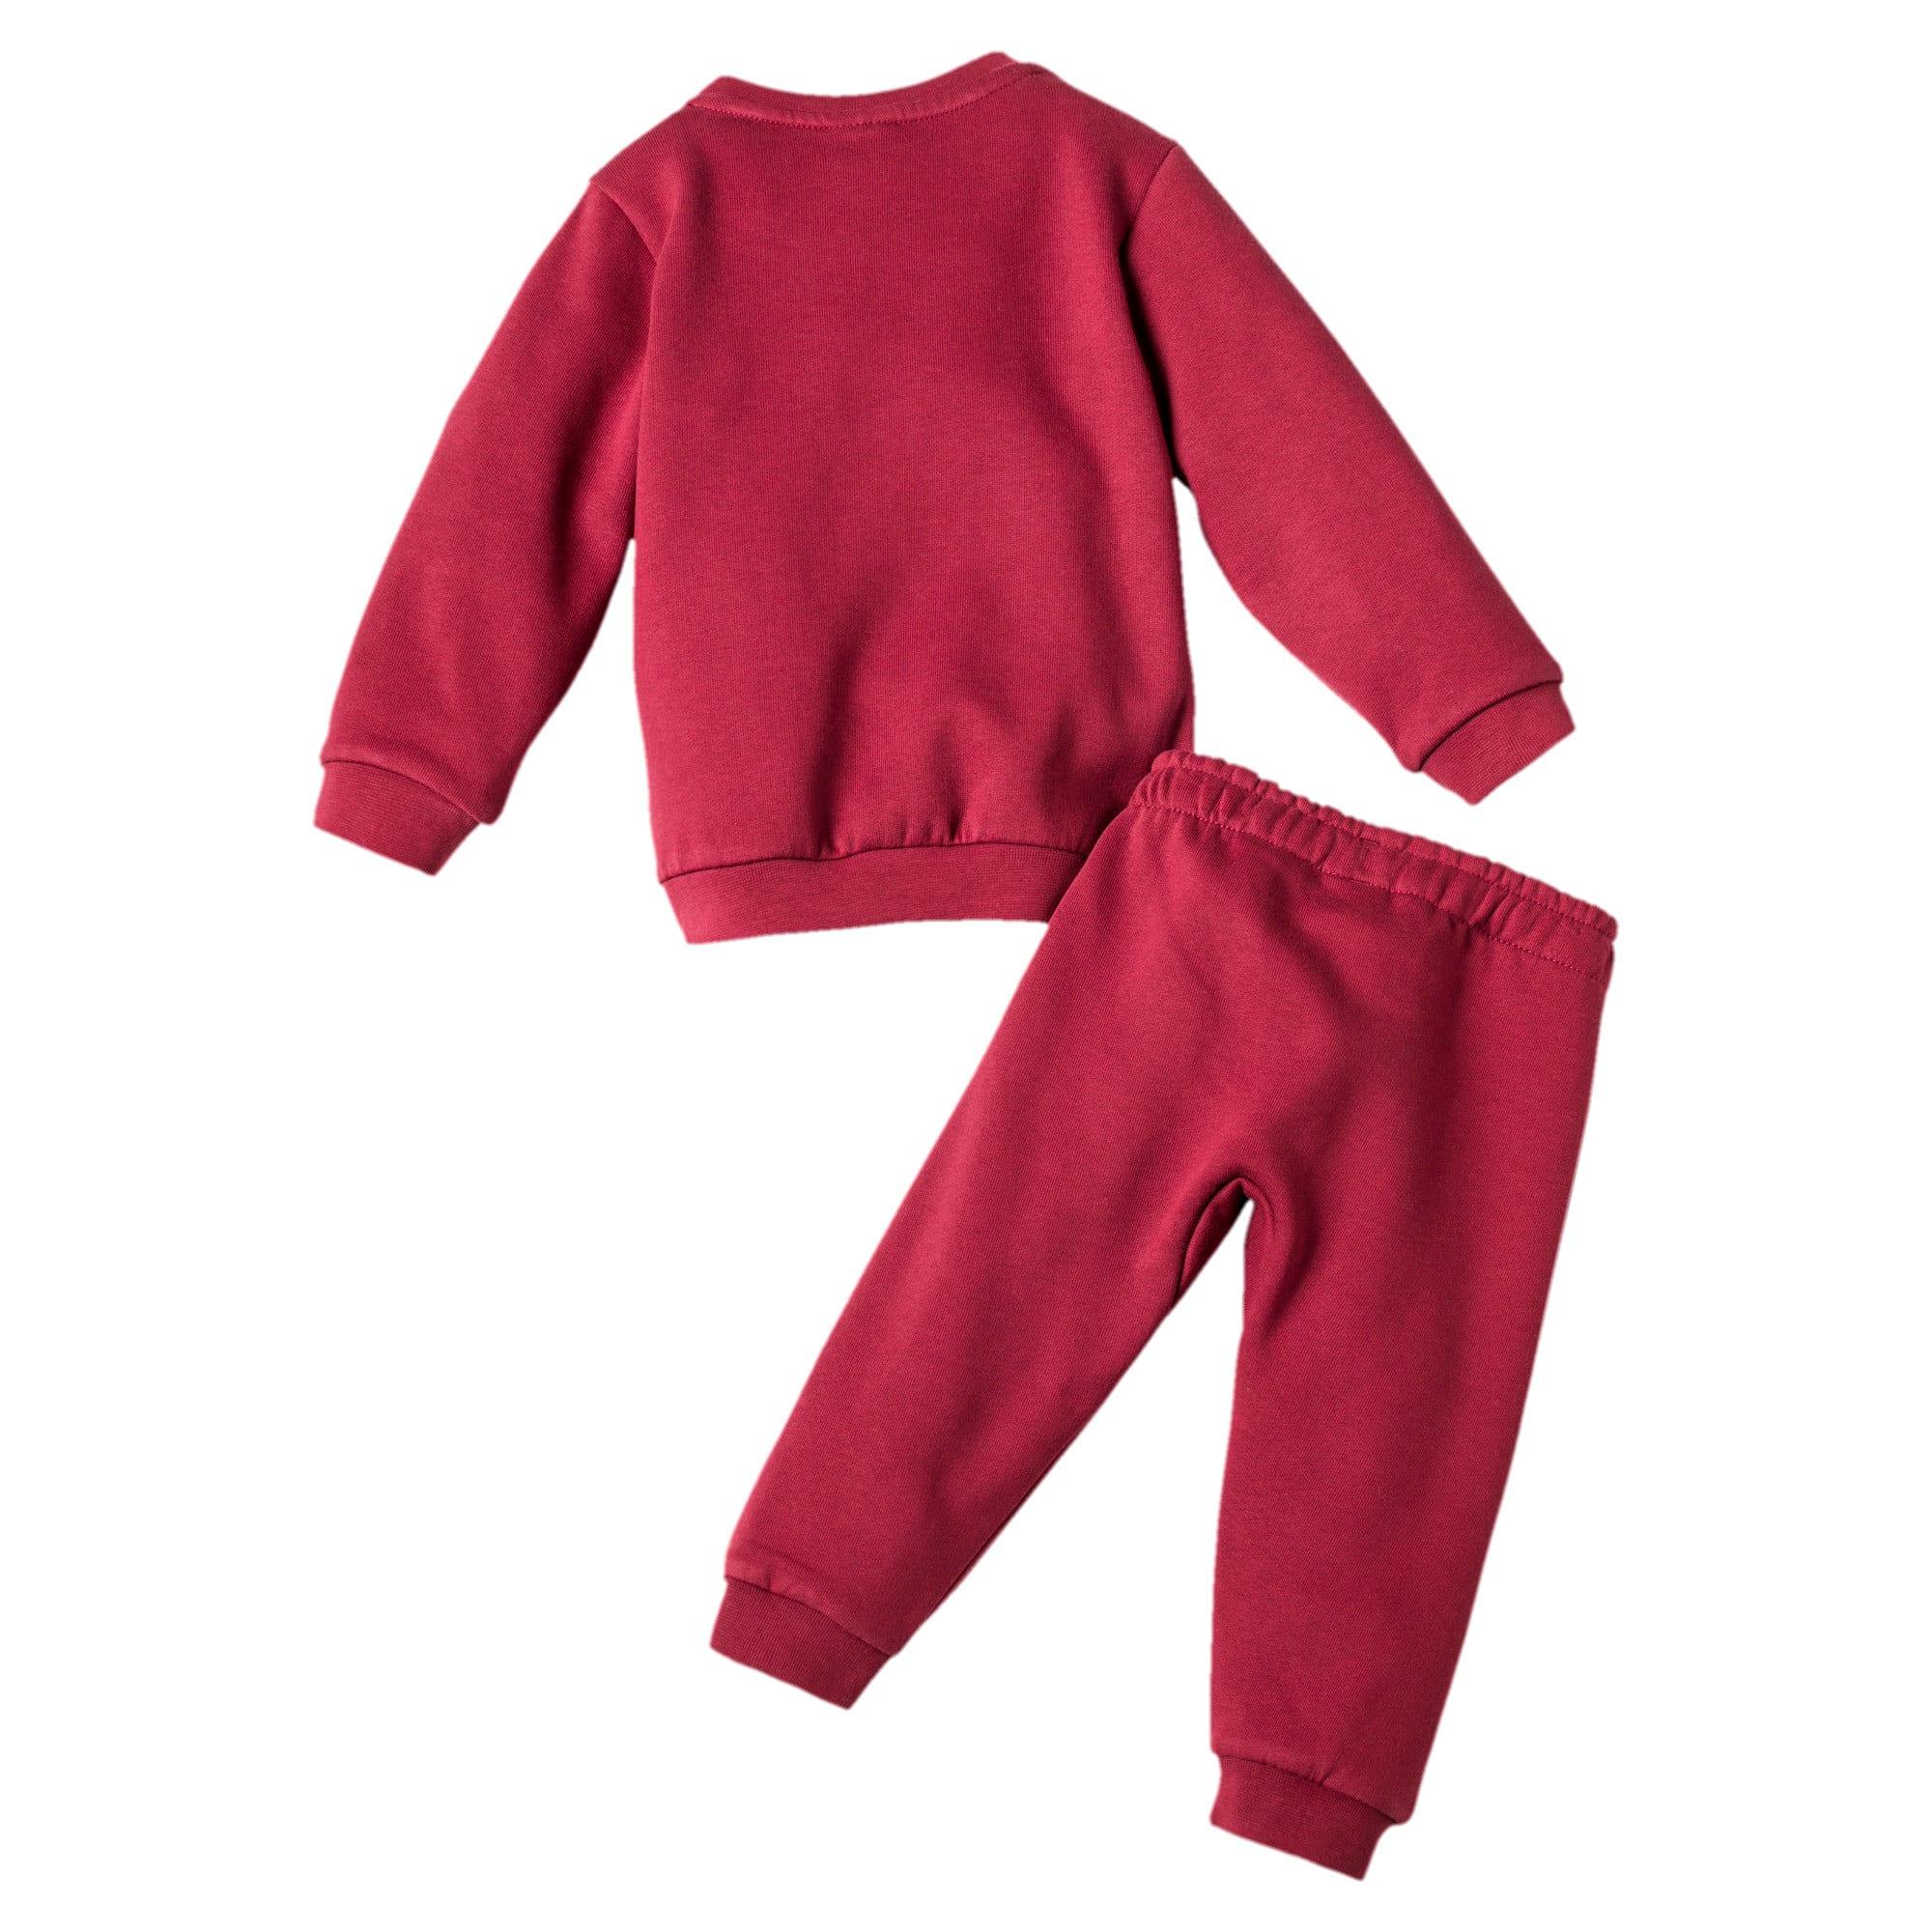 Thumbnail 2 of Streetwear joggingpakje voor baby's, Pomegranate, medium